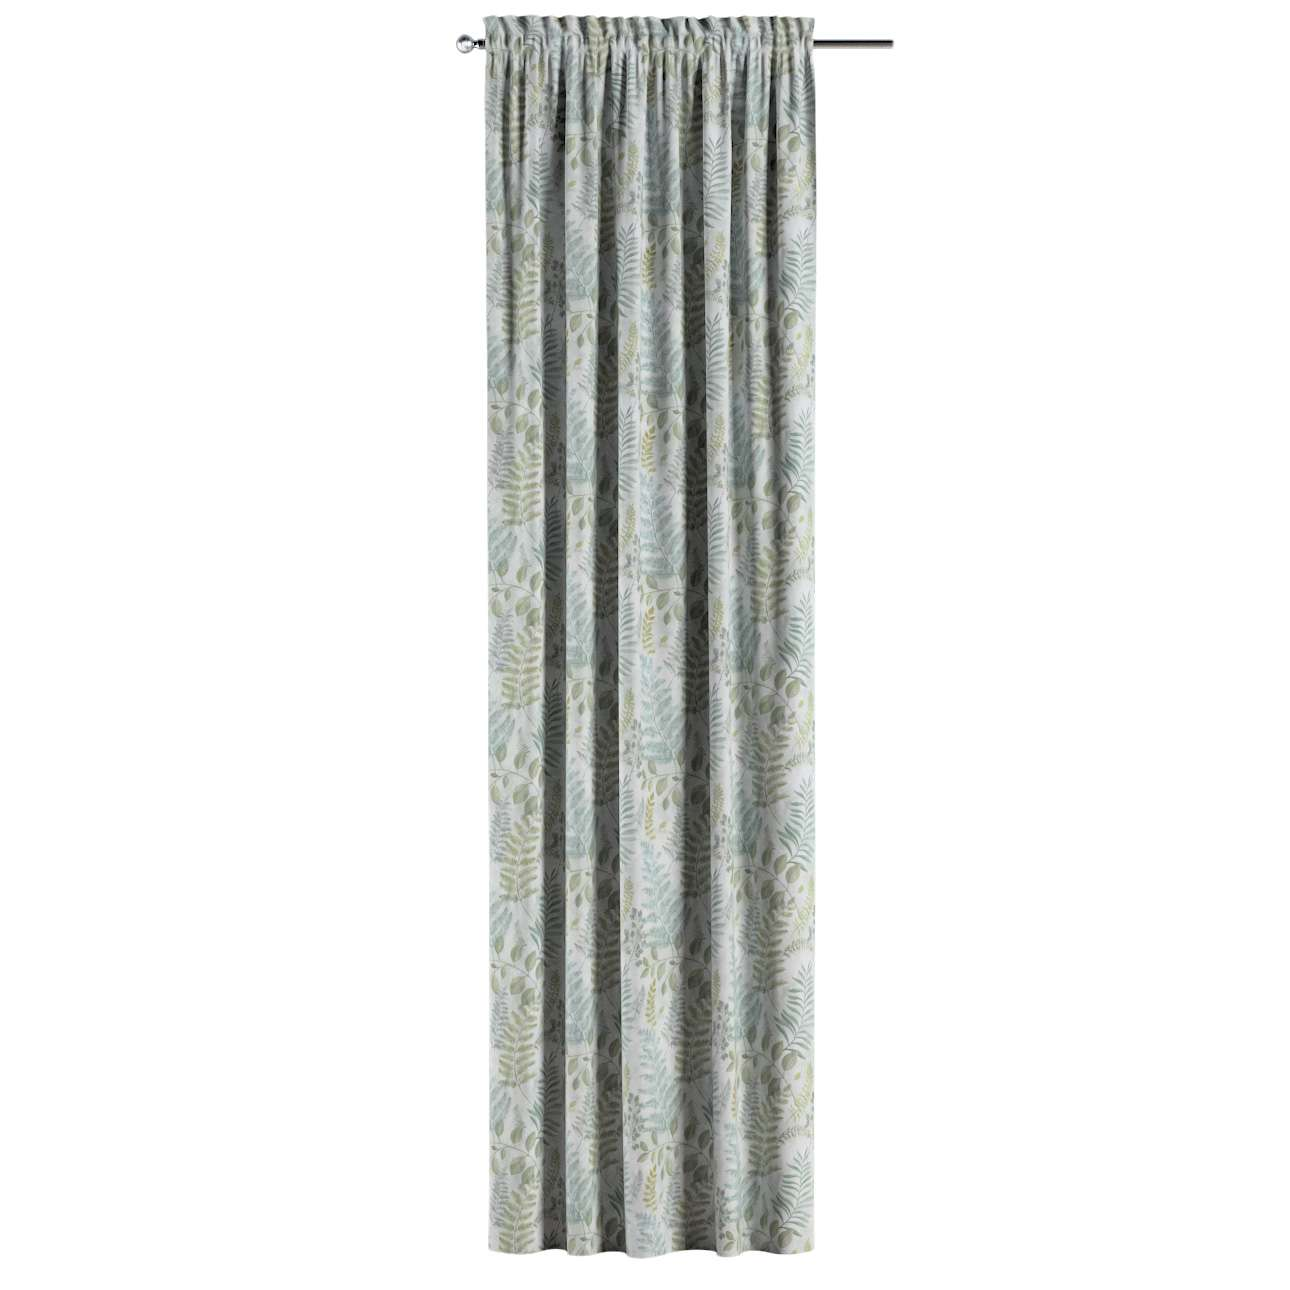 Gardin med løbegang - multibånd 1 stk. fra kollektionen Pastel Forest, Stof: 142-46